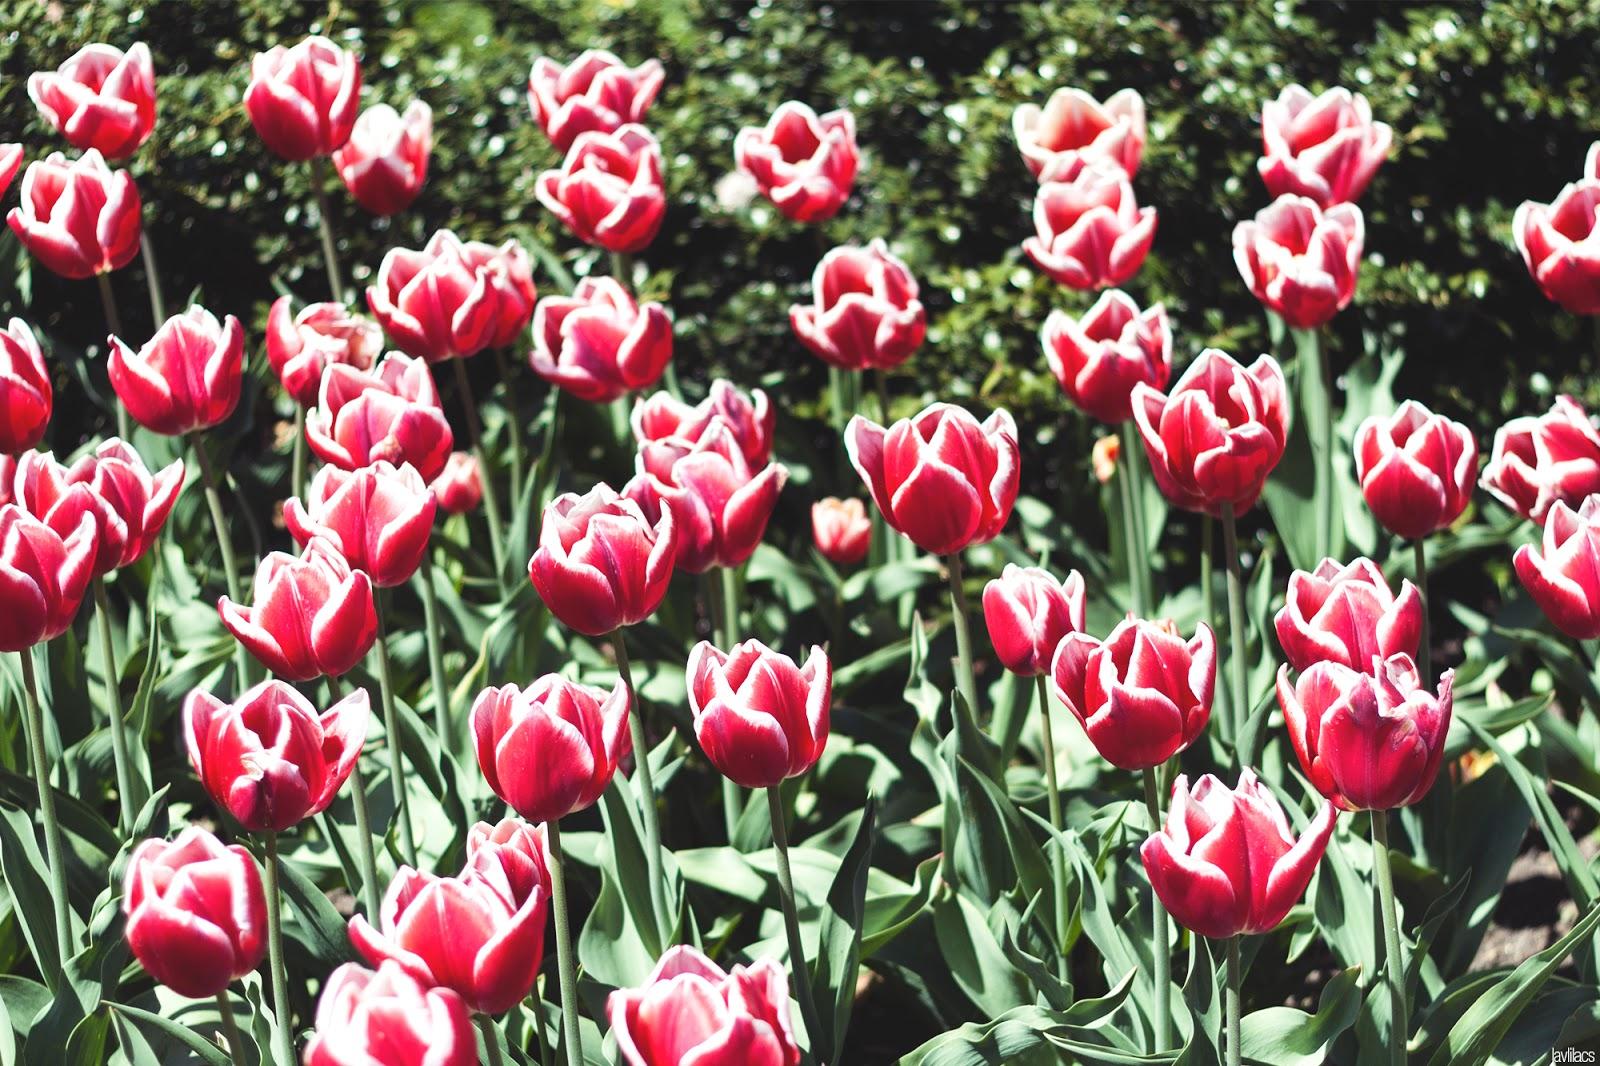 Brooklyn Botanic Garden - Red and White Tulips